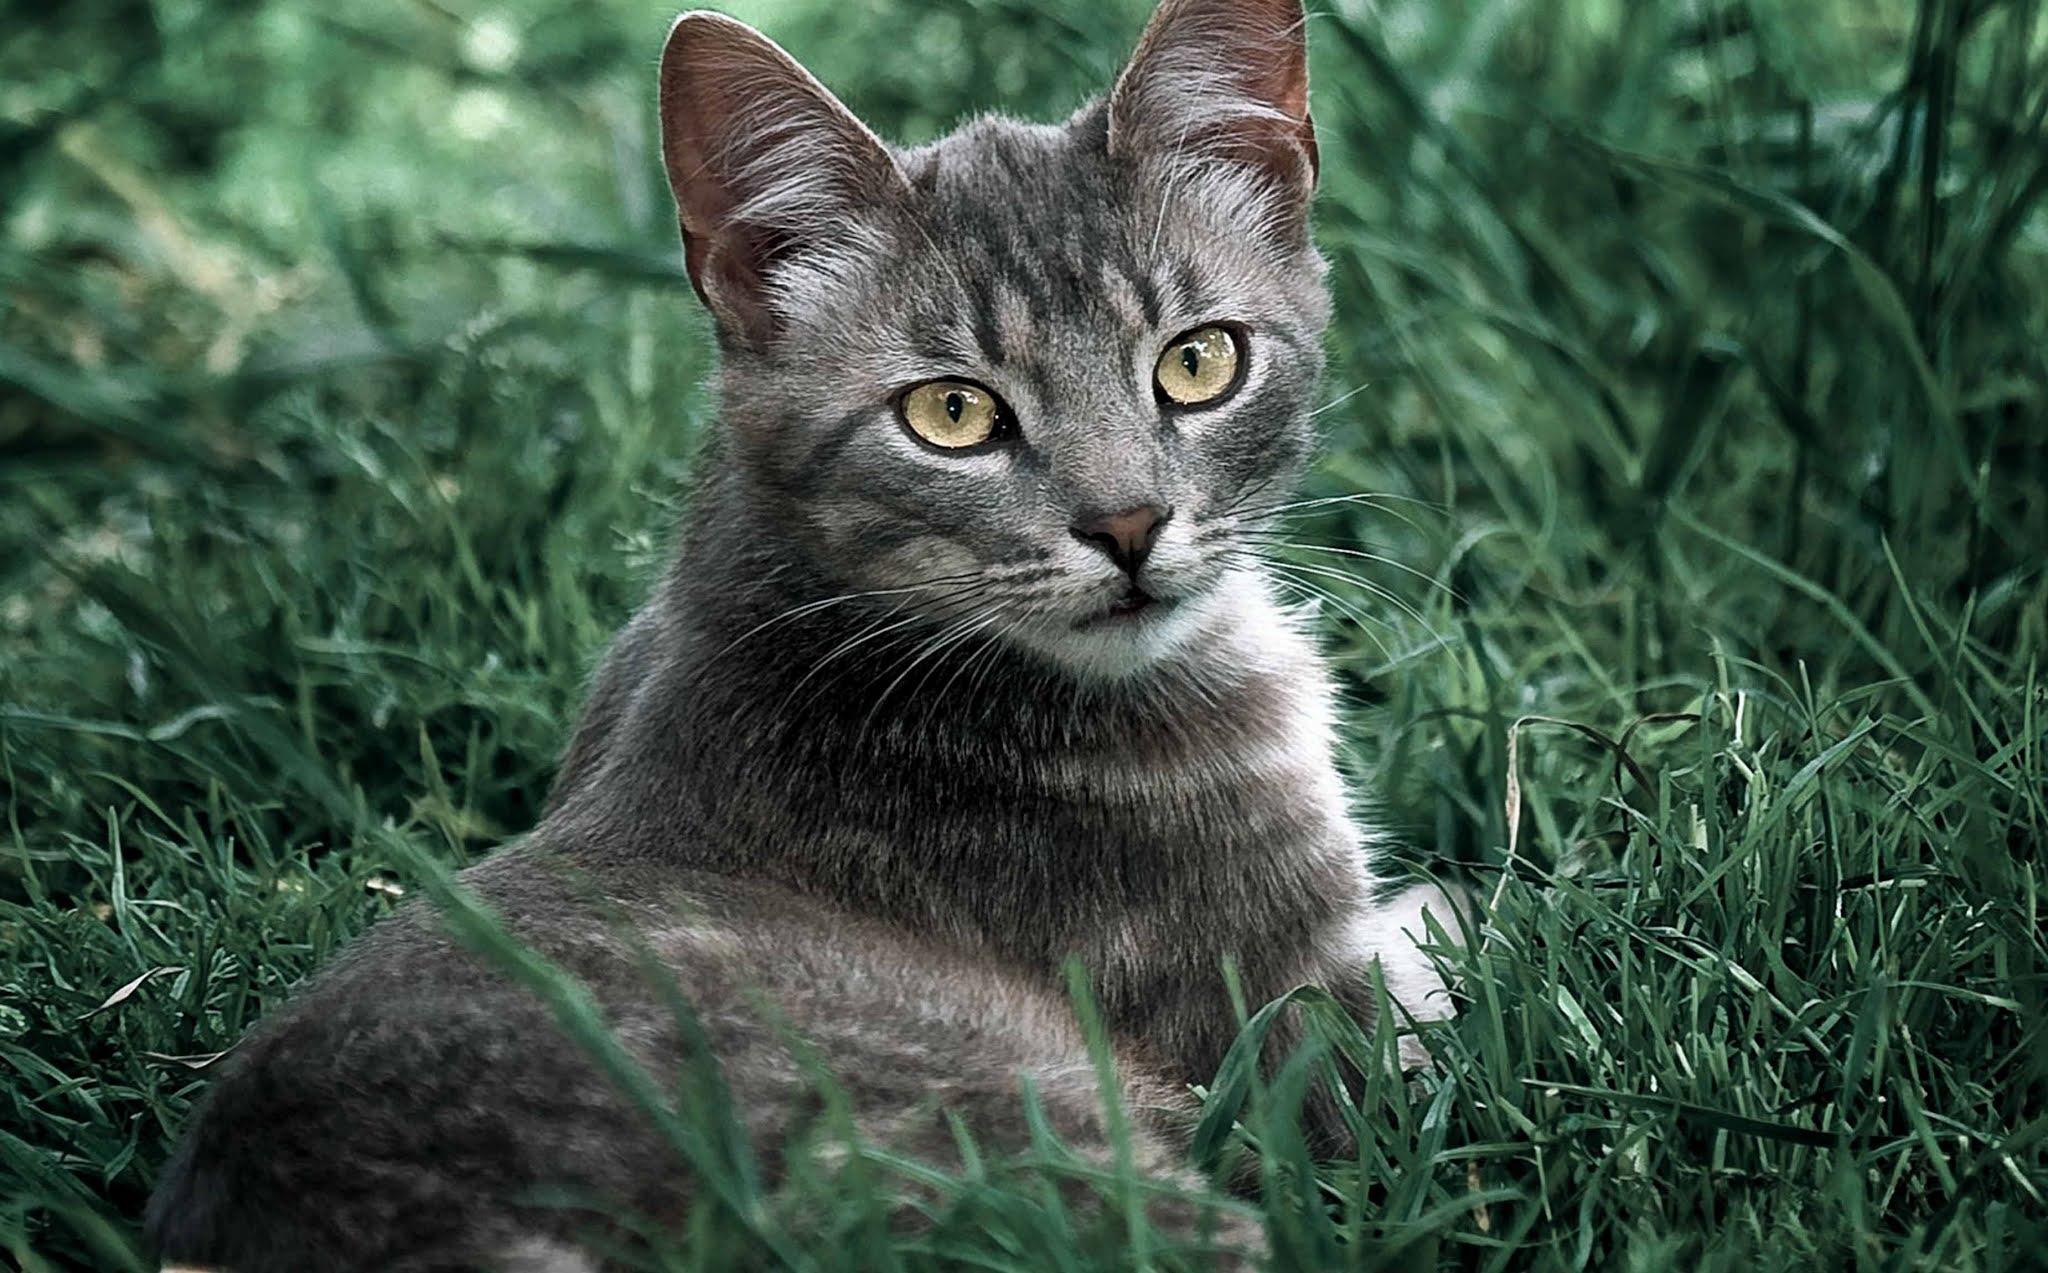 21 wallpaper image kitten, cat, cute, little wallpaper, background Ultra HD 4K 5K 8K for Computer Desktop